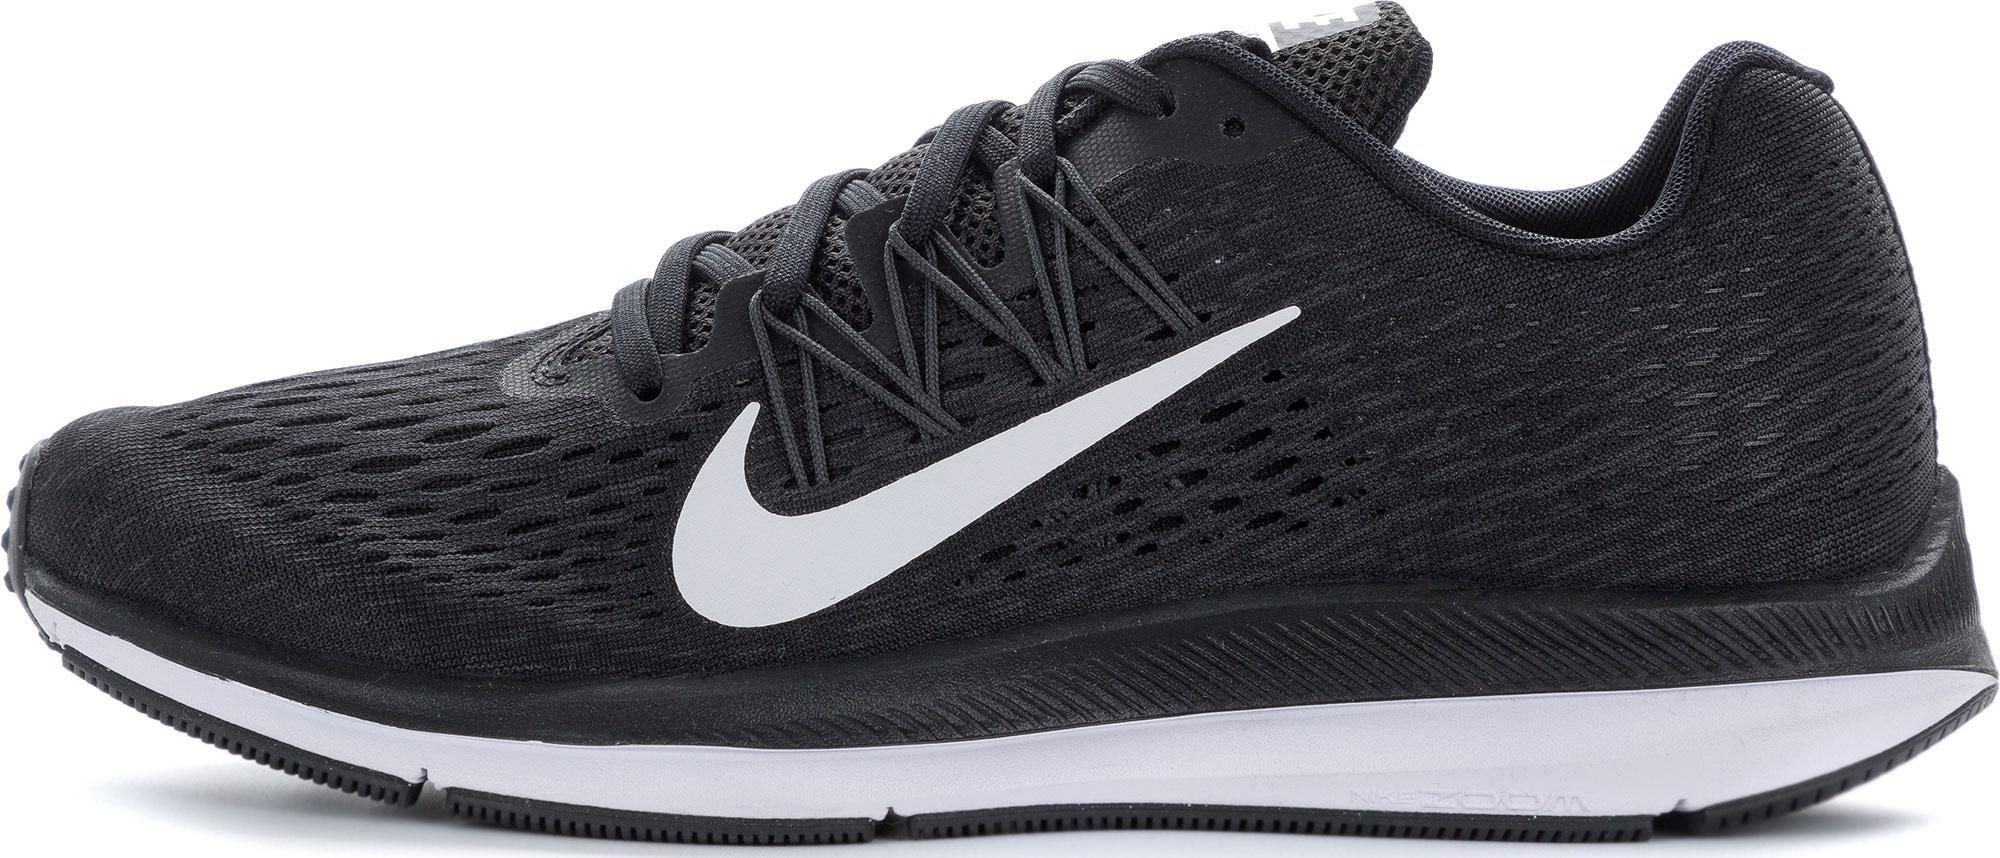 Nike Кроссовки женские Nike Winflo 5, размер 39,5 цена